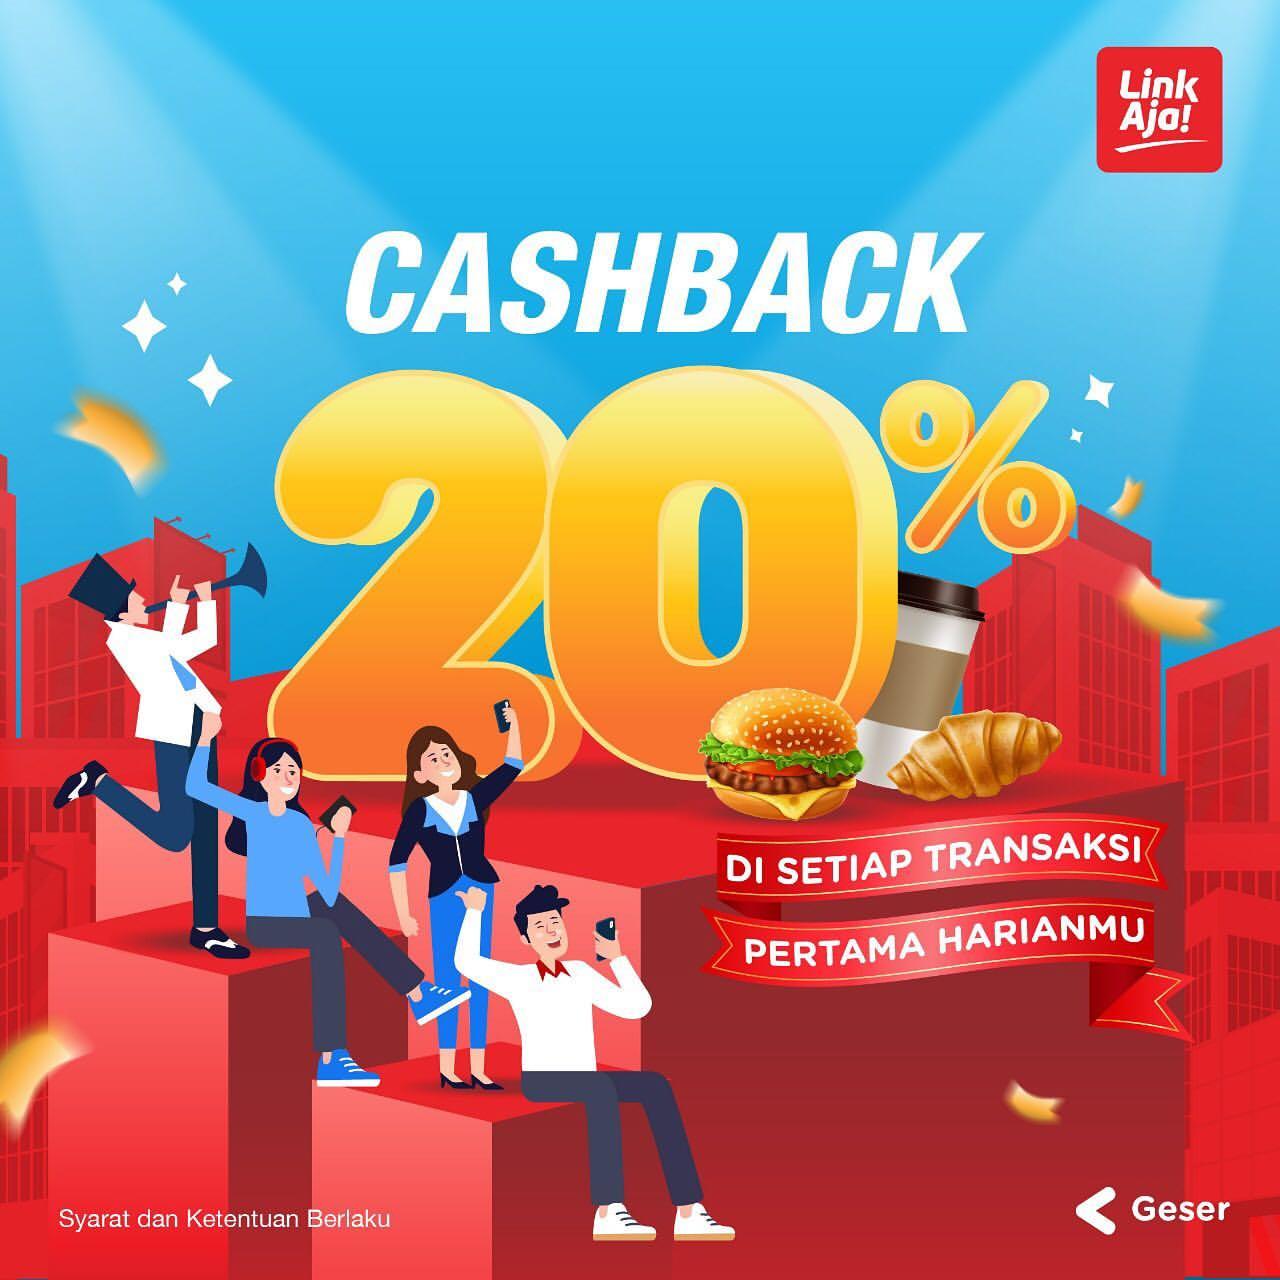 LINKAJA Promo Cashback 20% setiap transaksi pertama harianmu